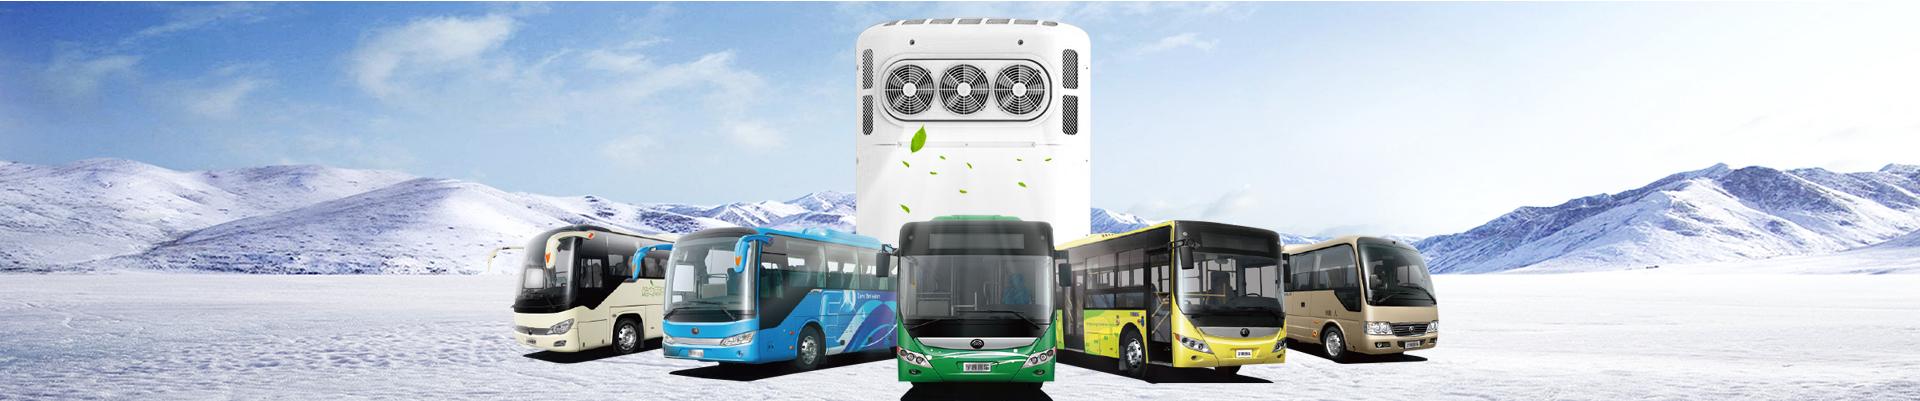 AirSuper400 Bus Air Conditioner Suppliers-KingClima